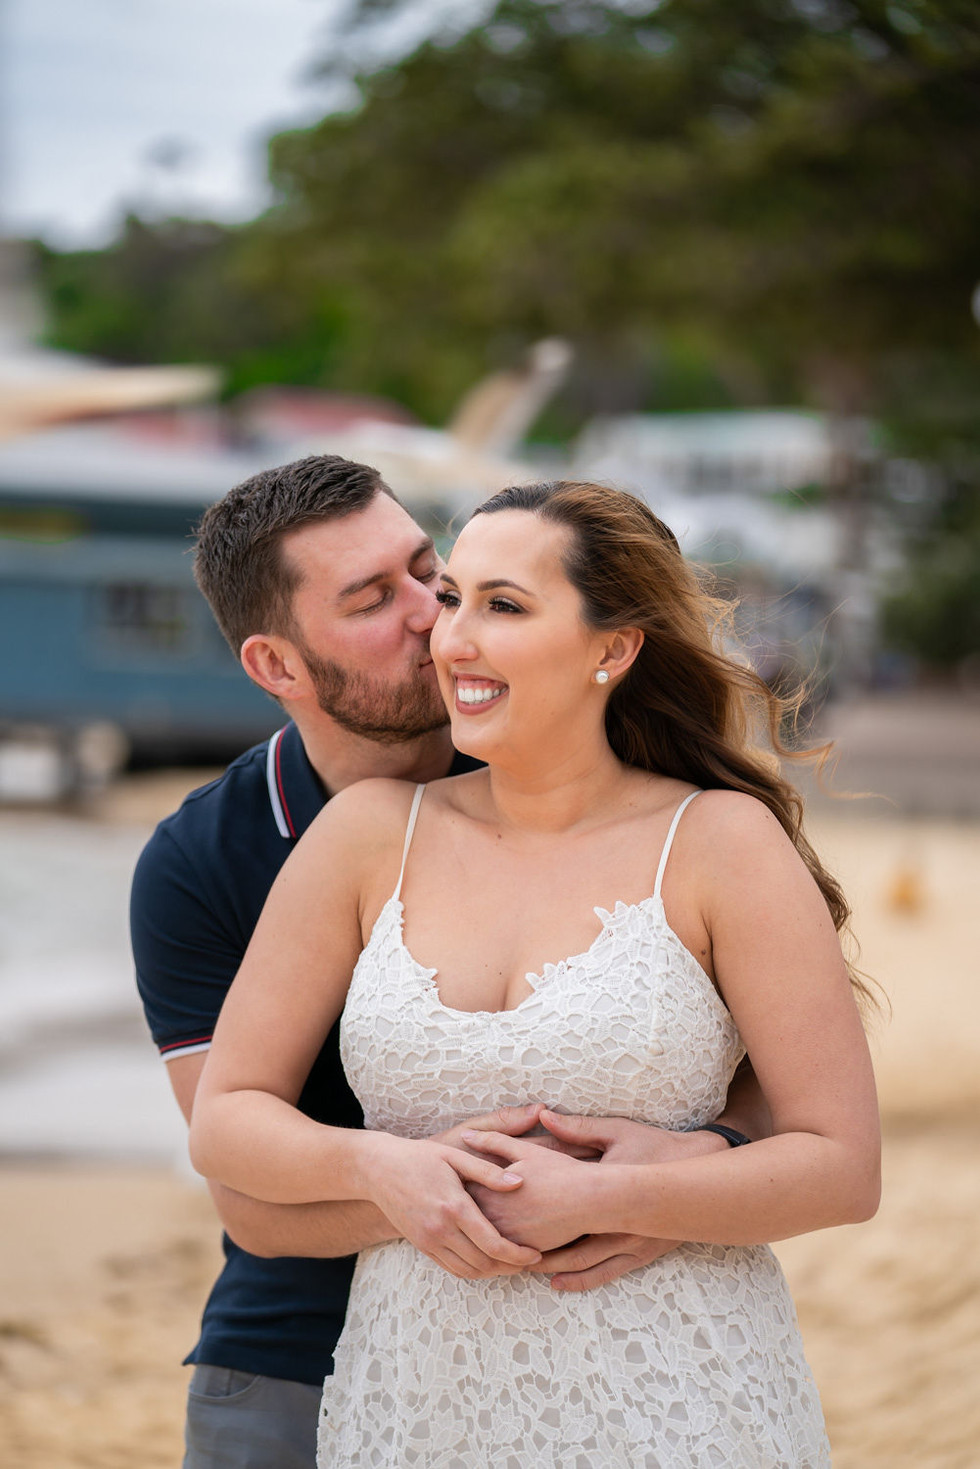 sydney-best-wedding-photographer (2).jpg